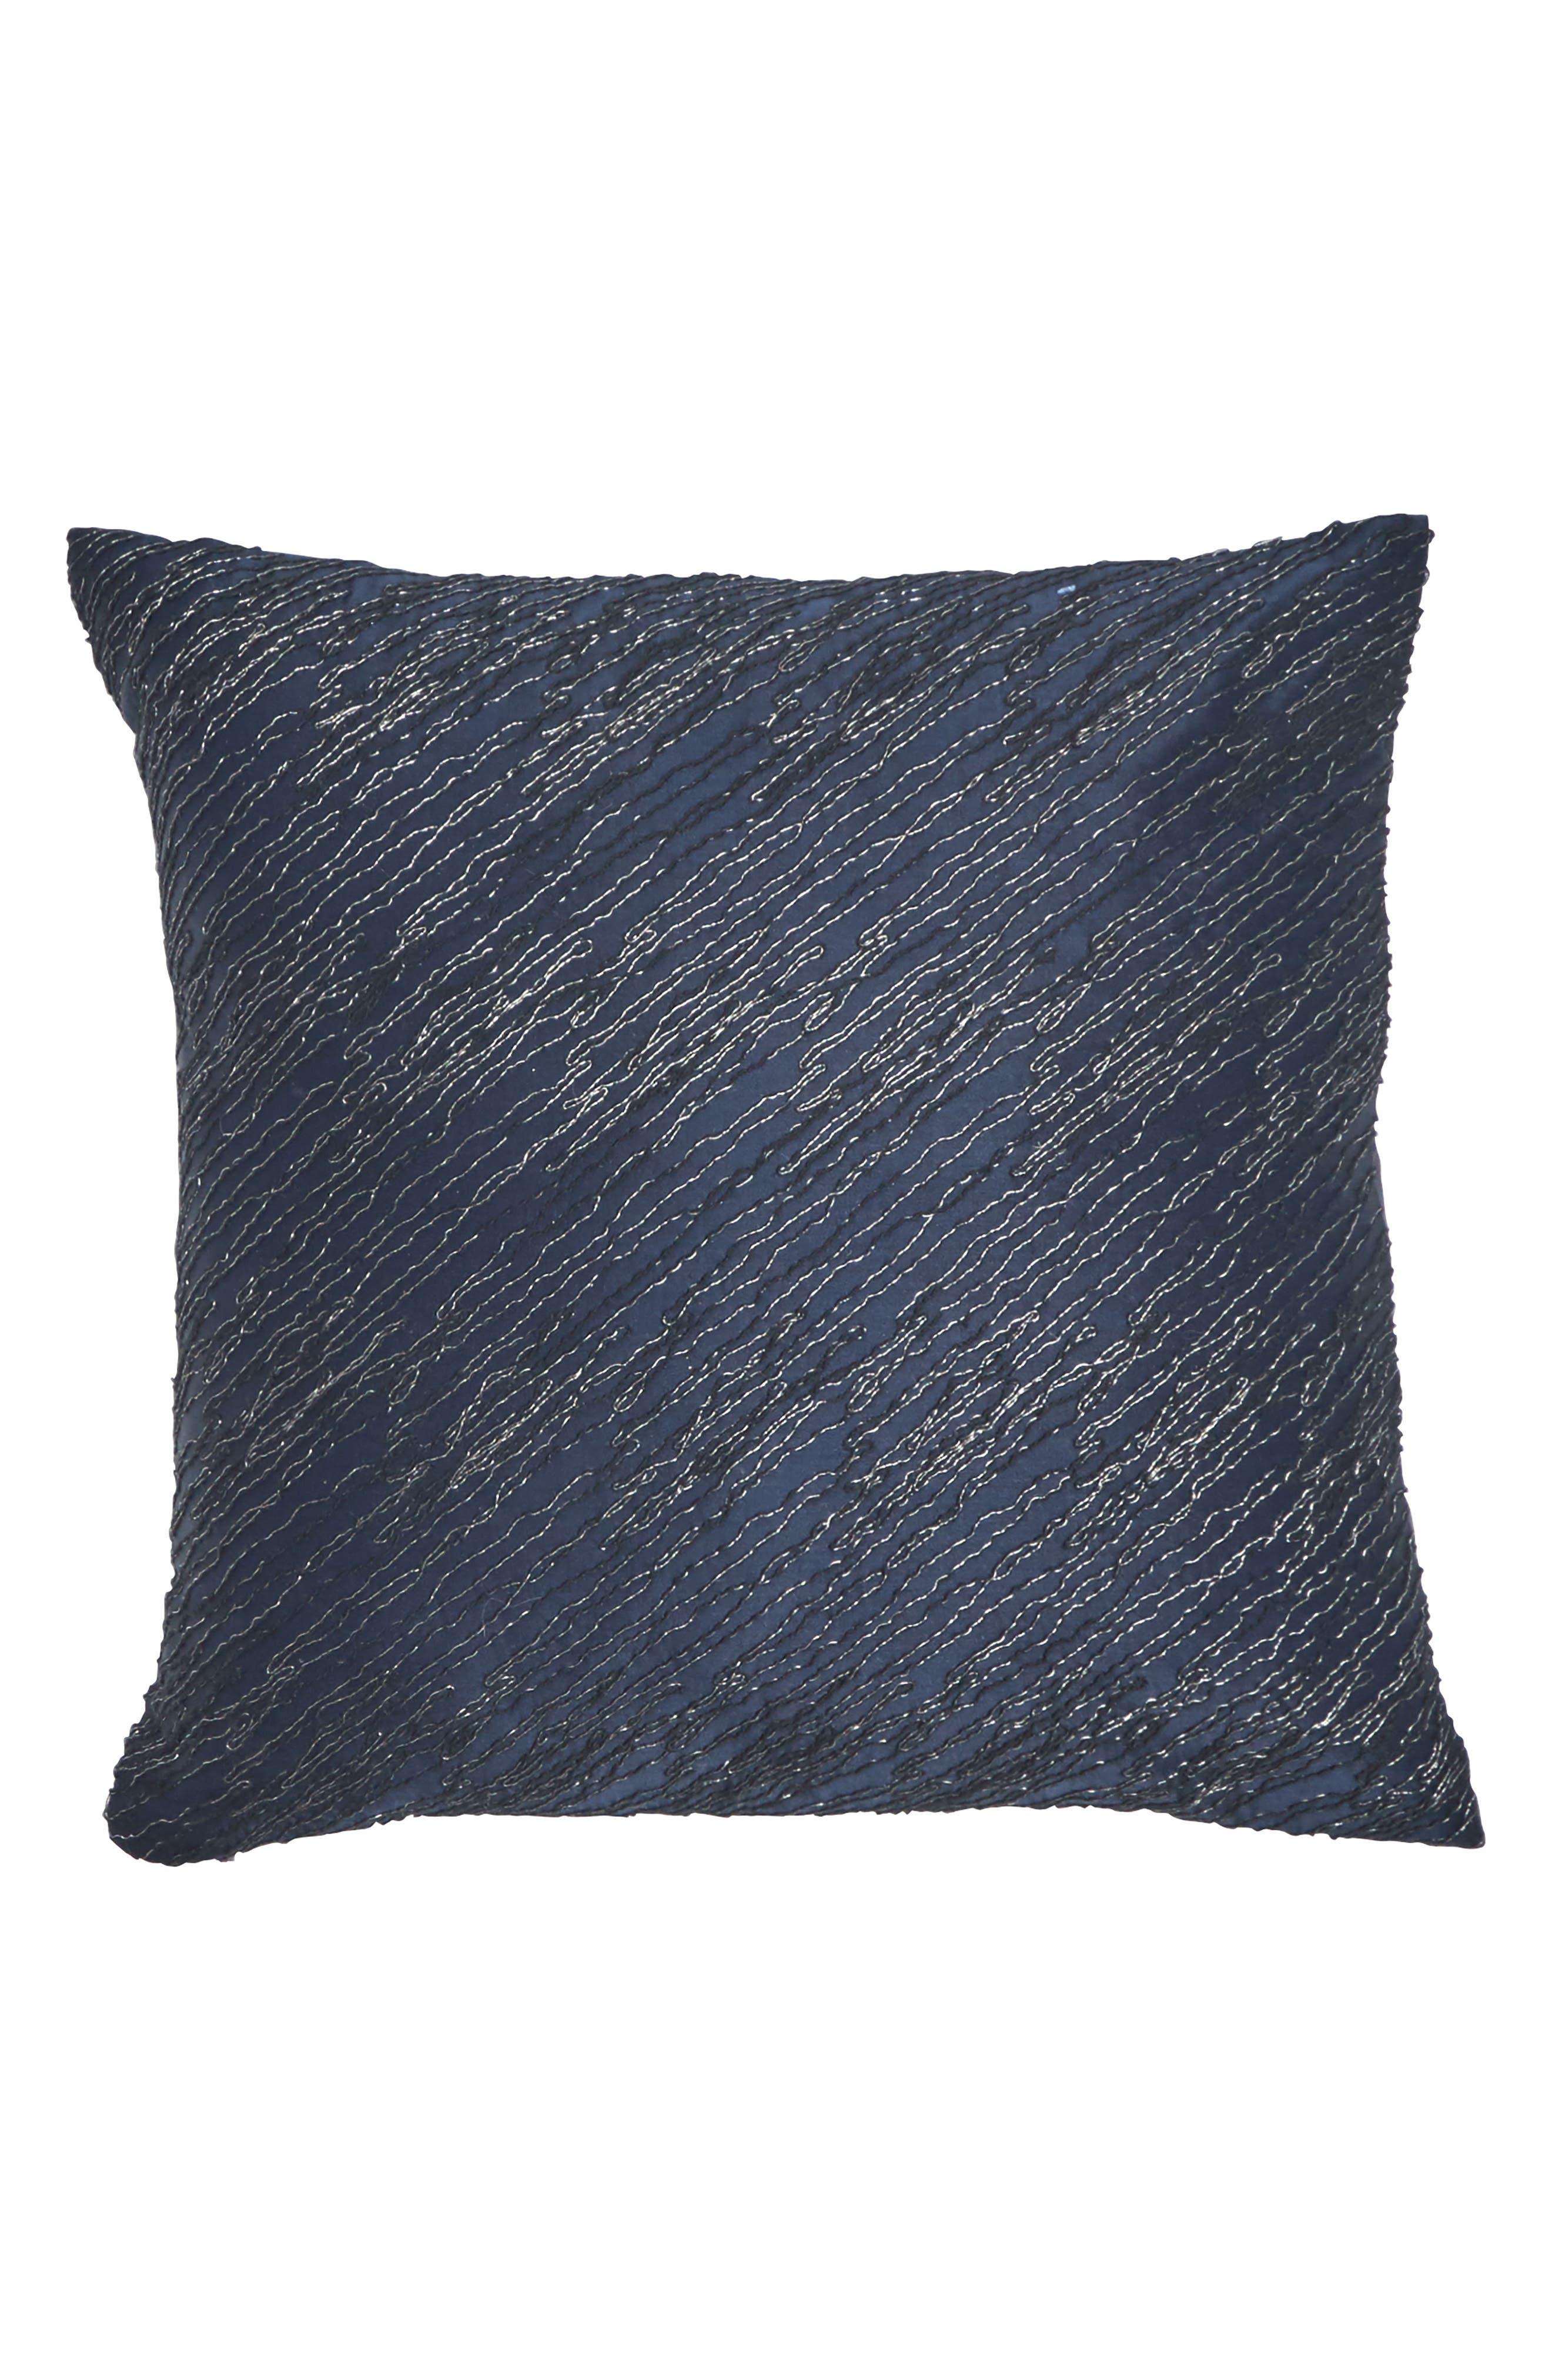 Ocean Pillow,                             Main thumbnail 1, color,                             Navy